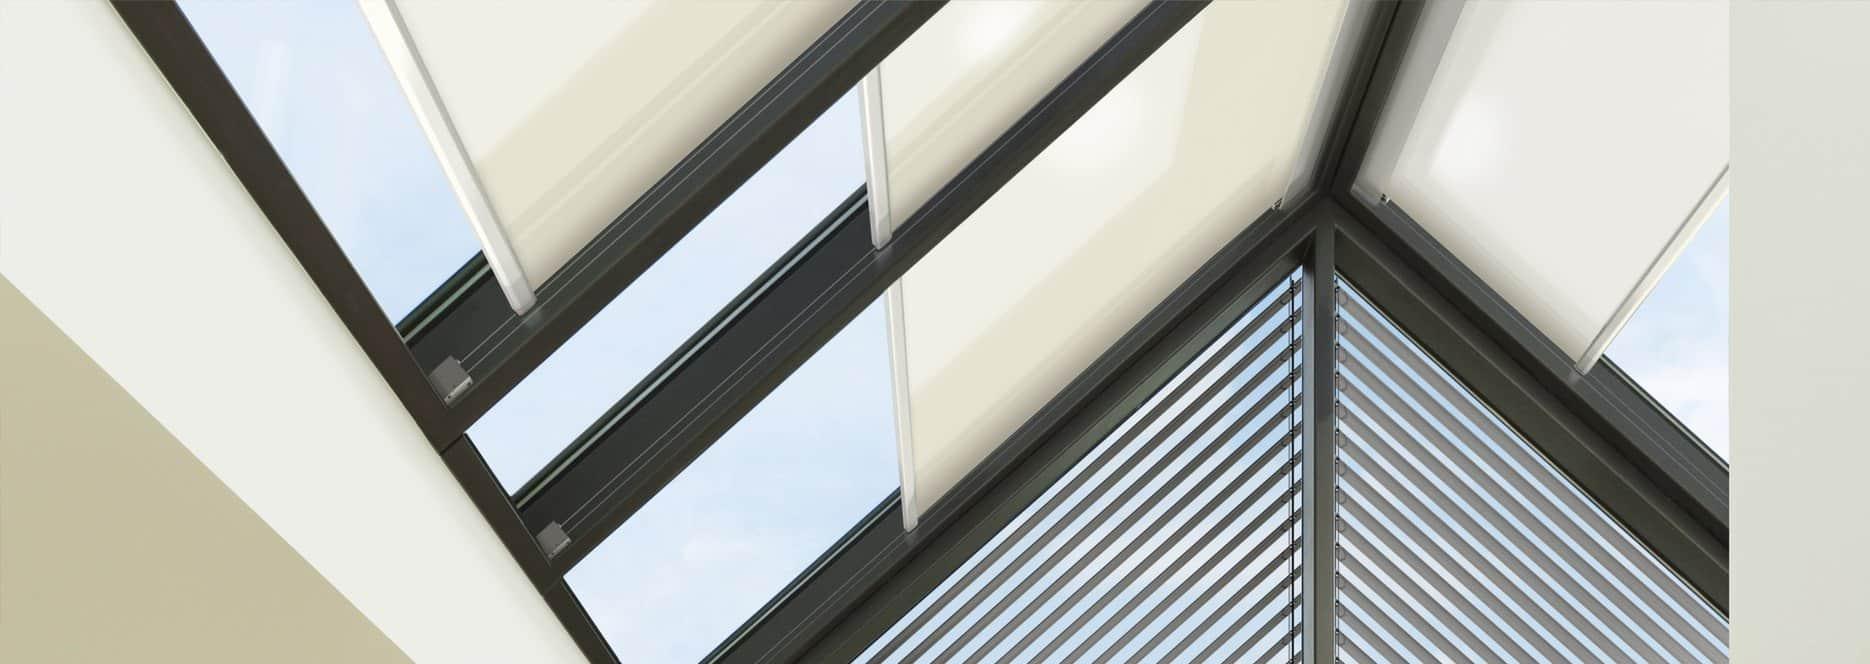 Warema ceiling and atrium roller blinds